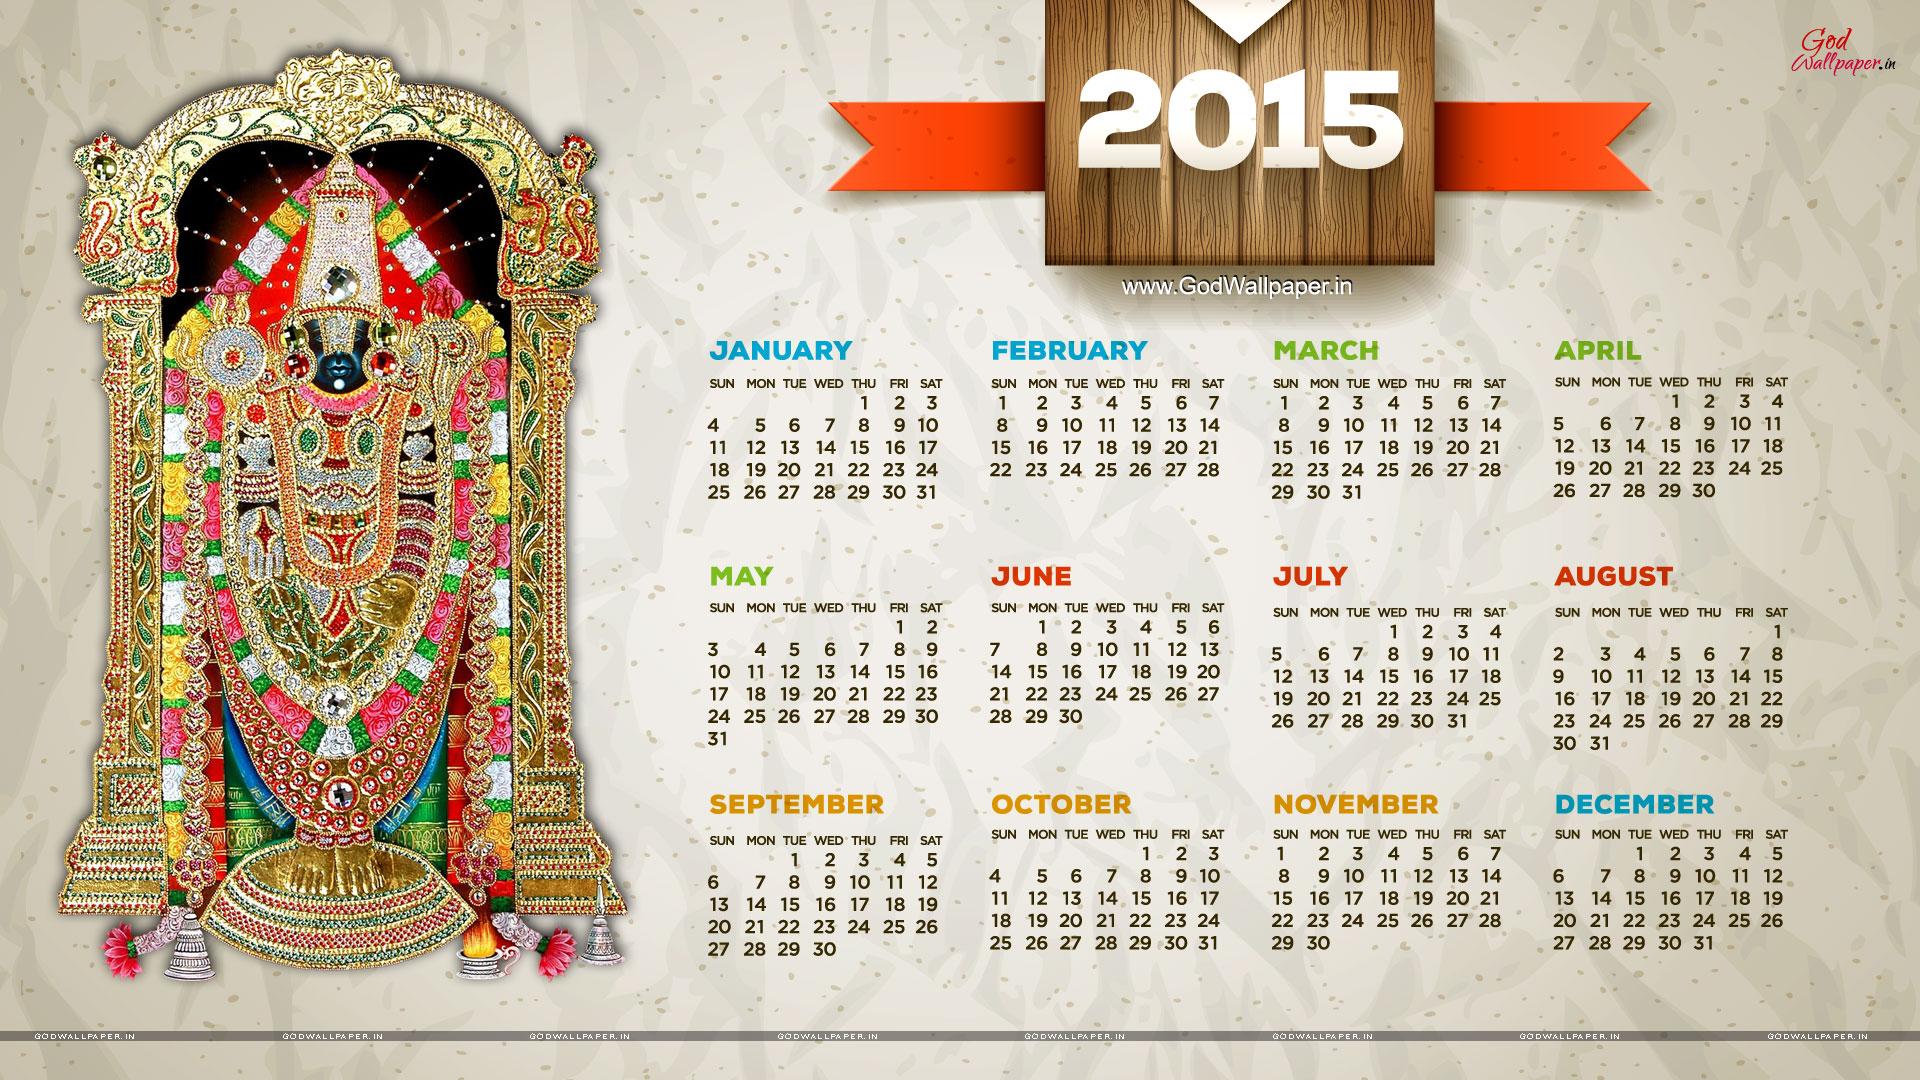 Hindu God Wallpapers Desktop Wallpaper Calendar 2015 Download 1920x1080